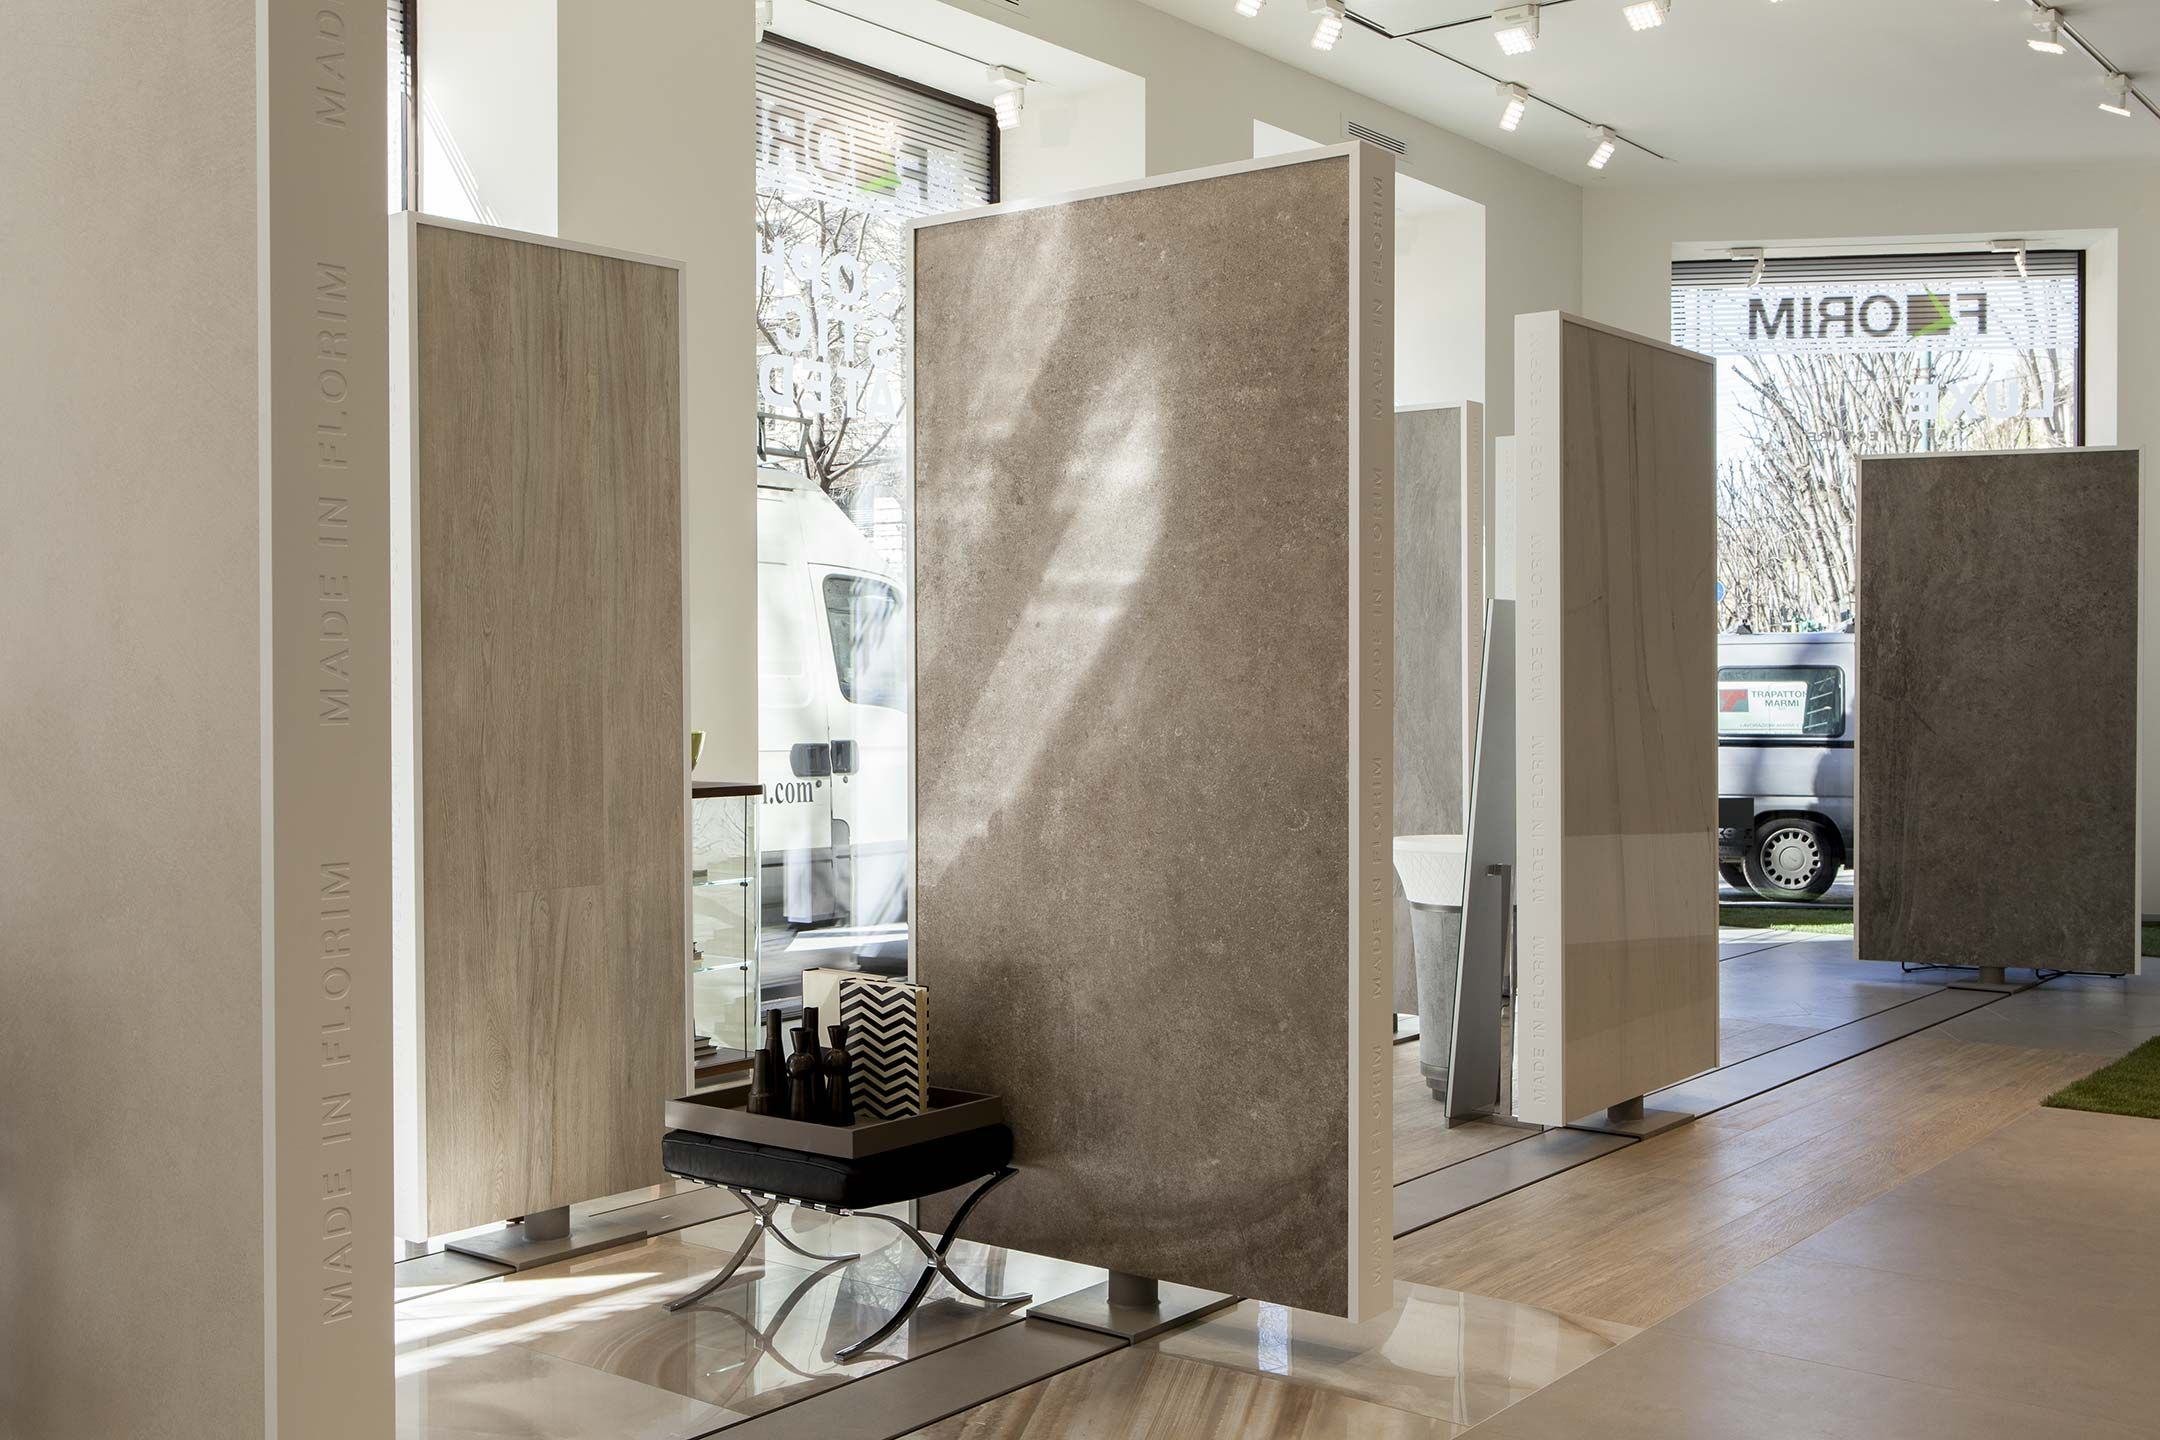 Showroom piastrelle milano gruppo florim project shwrm reno pinterest showroom casa - Showroom piastrelle milano ...